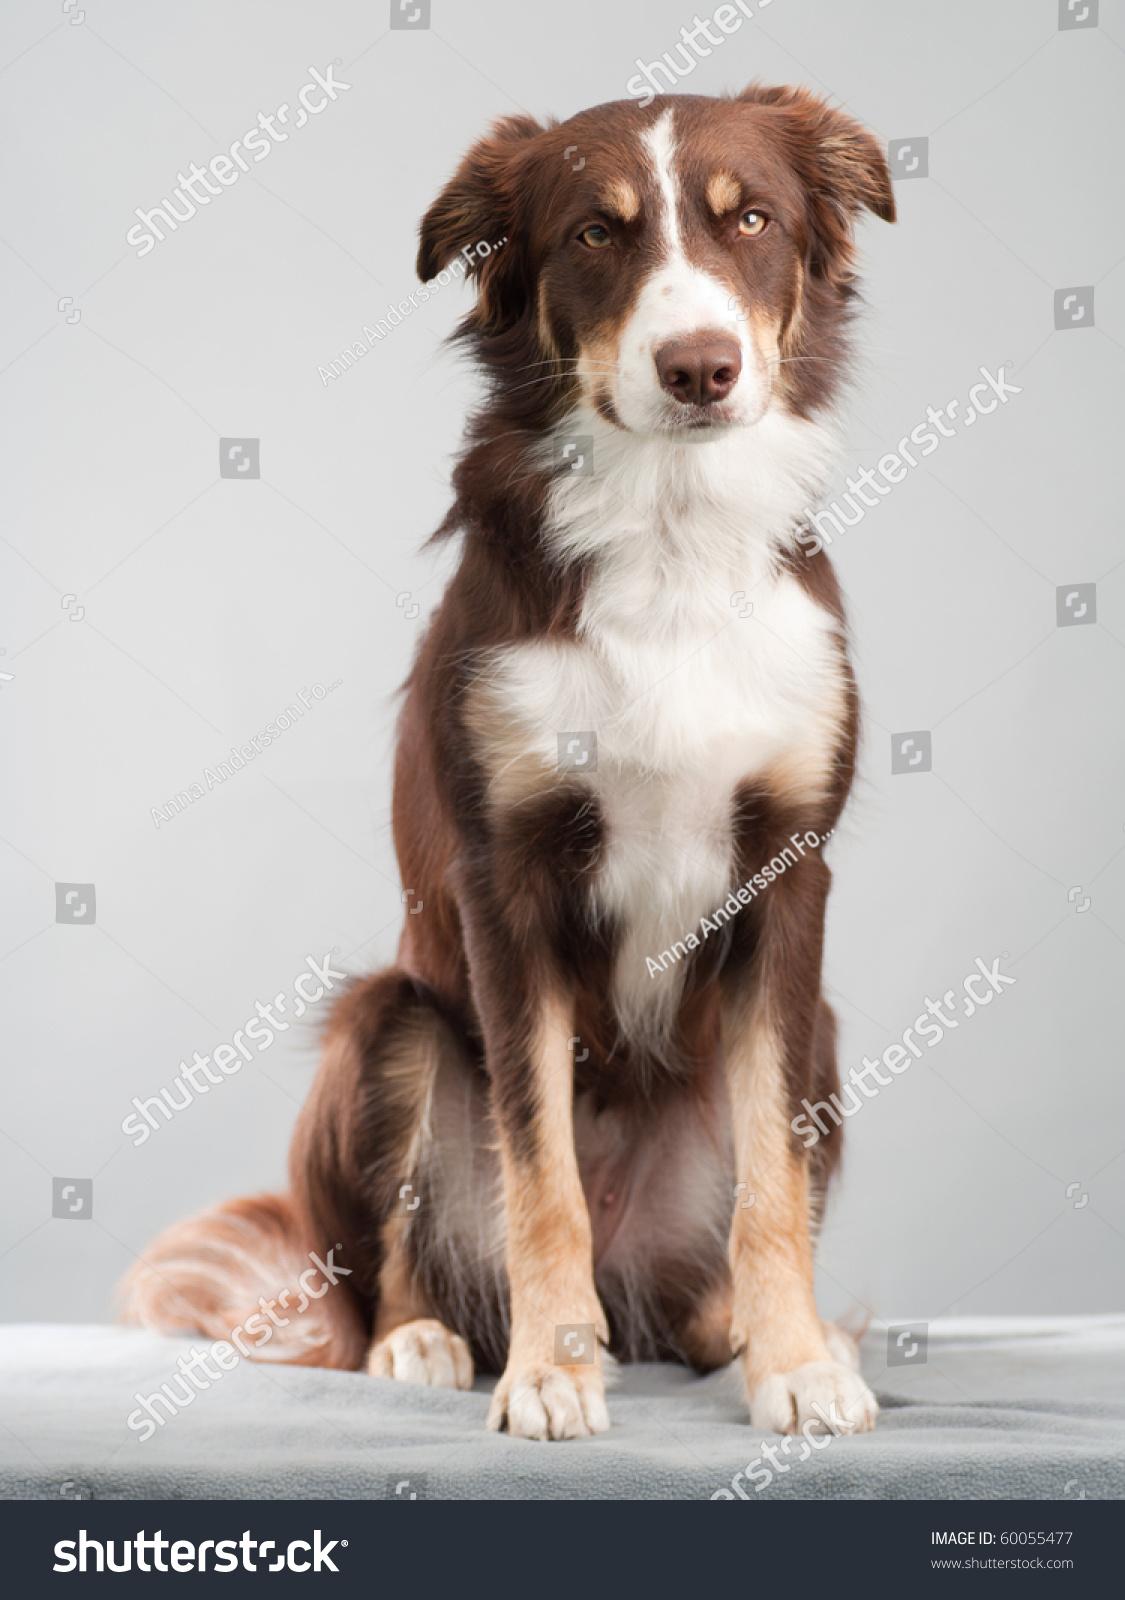 Brown Bordercollie Sitting Studio Stock Photo 60055477 ... Black Russian Terrier